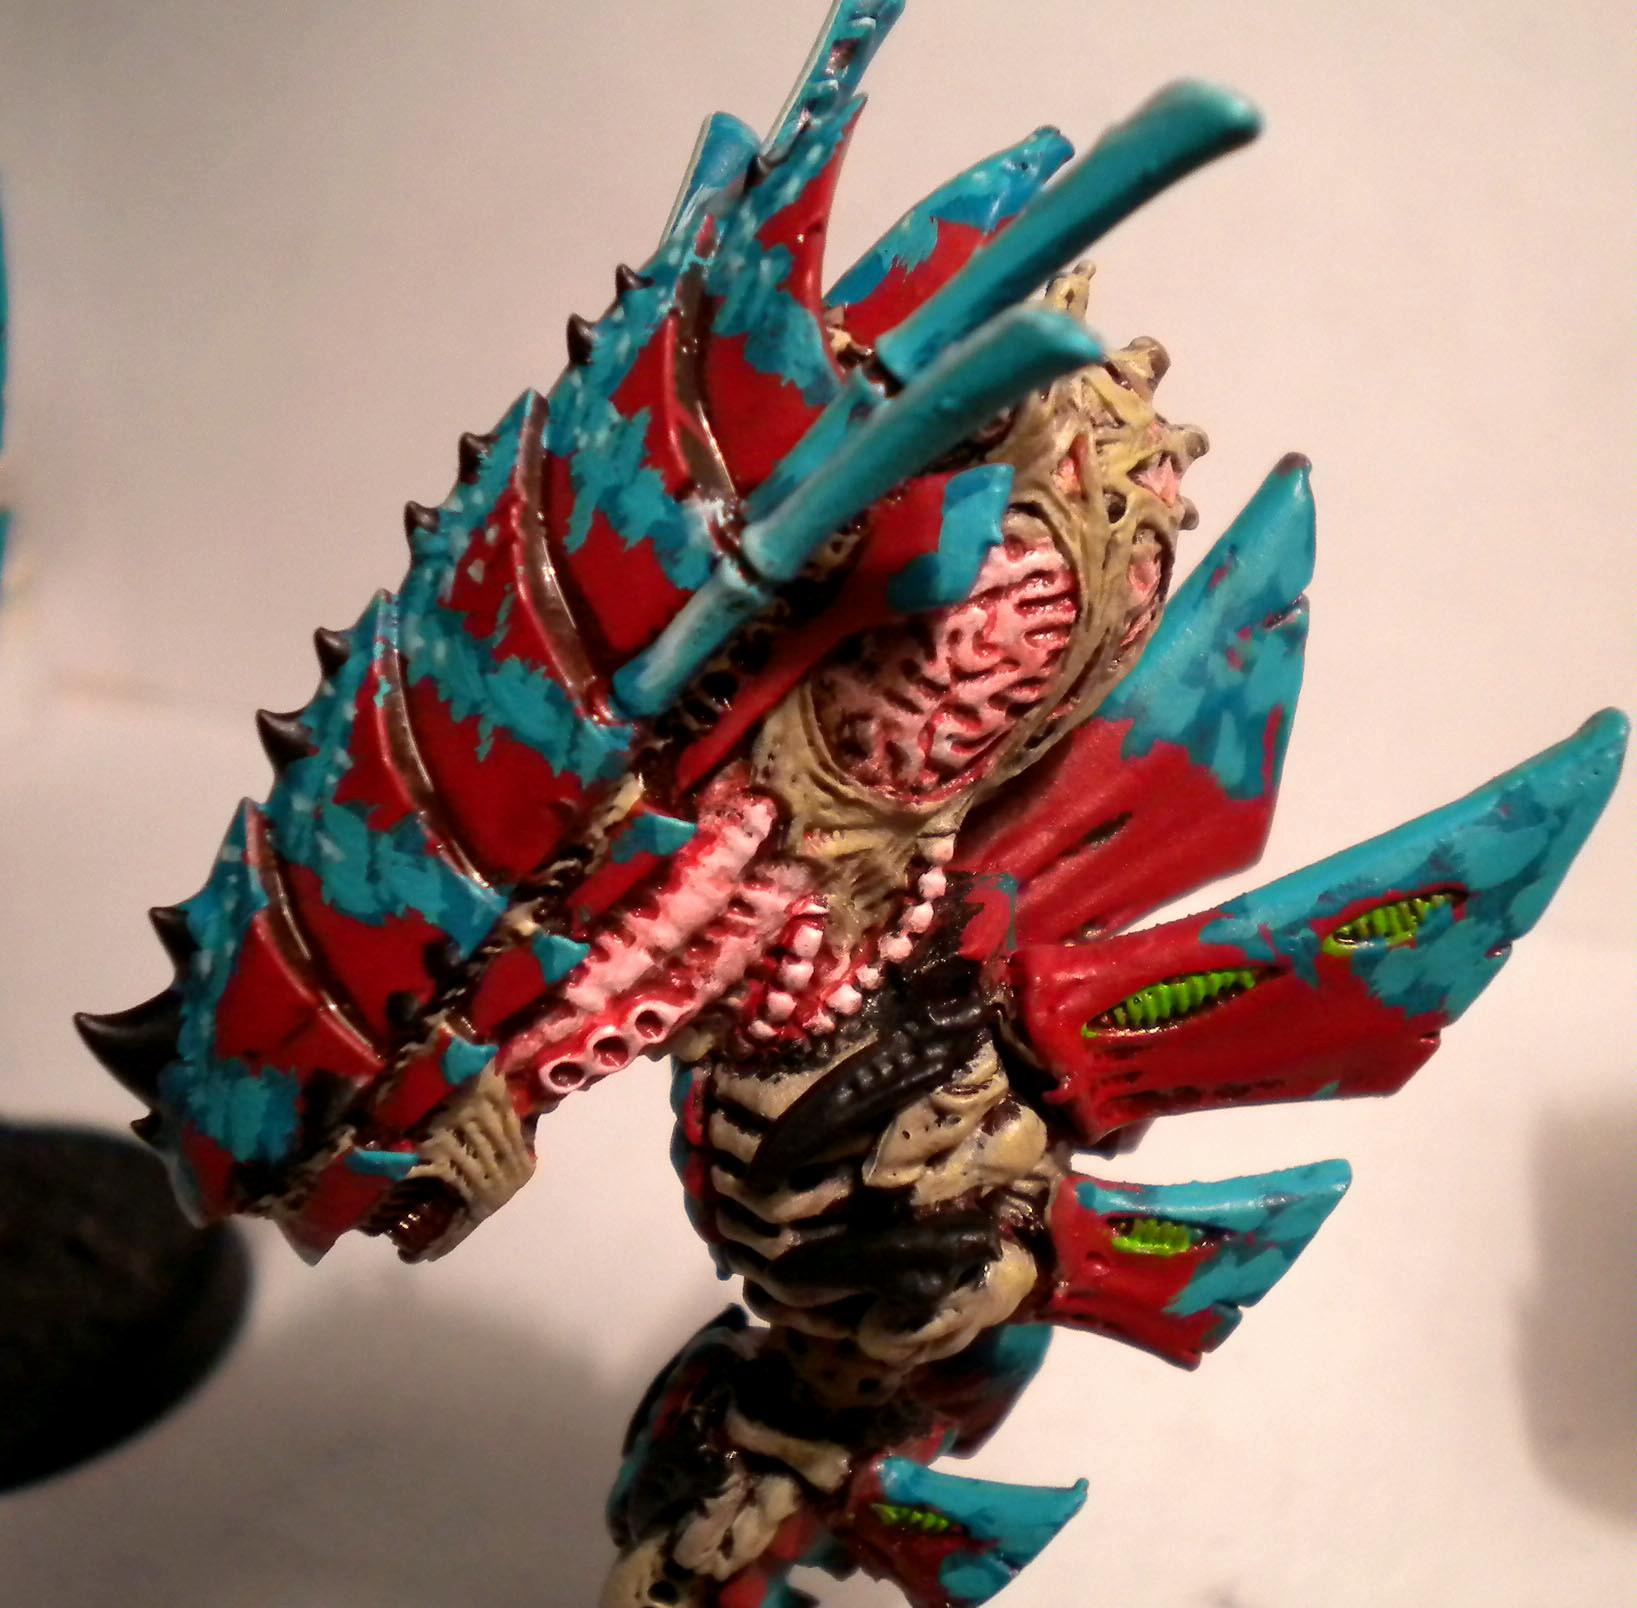 Hive Fleet Kraken, Painting Challenge, Tyranids, Warhammer 40,000, Work In Progress